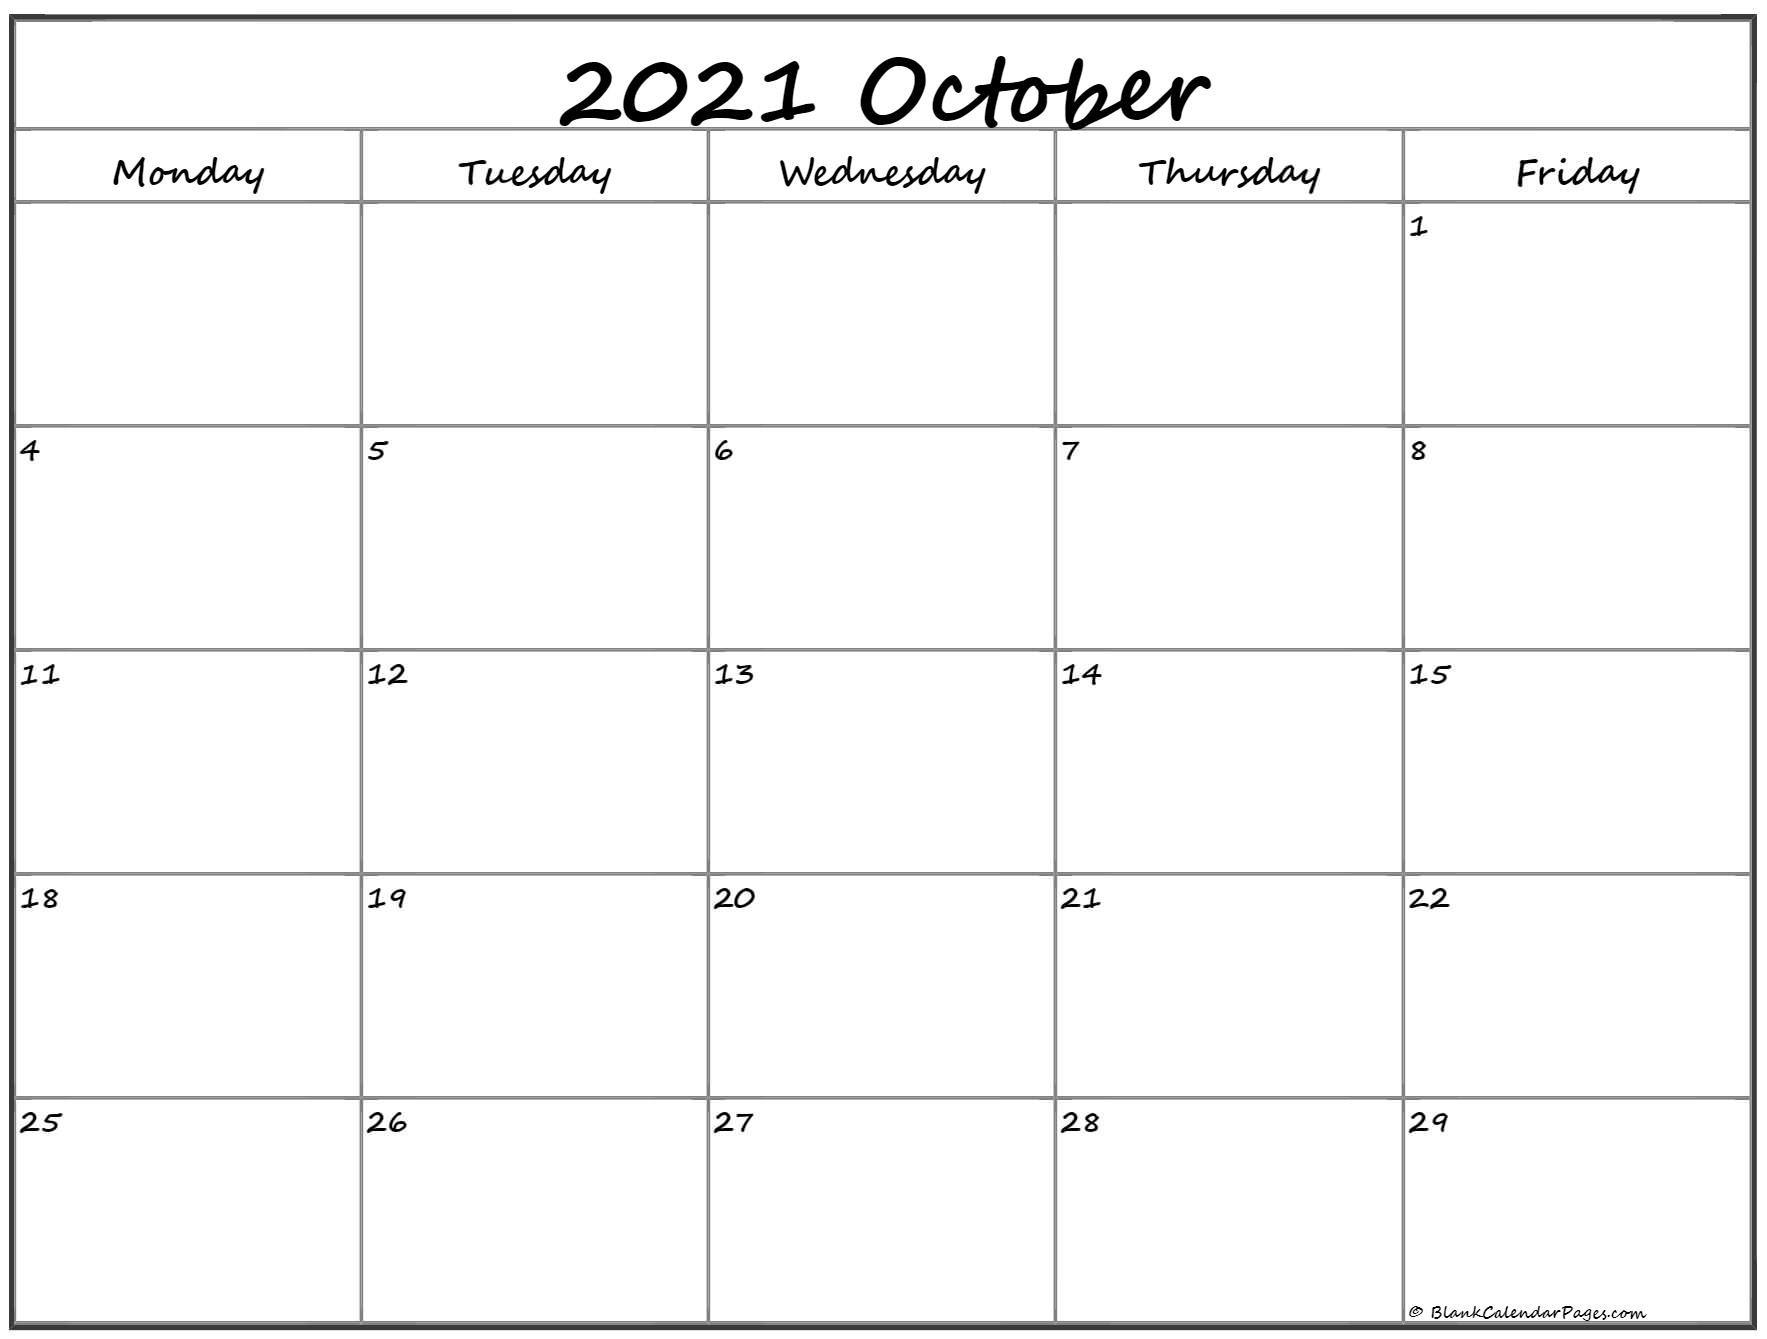 October 2021 Monday Calendar | Monday To Sunday-Printable Monday - Friday July 2021